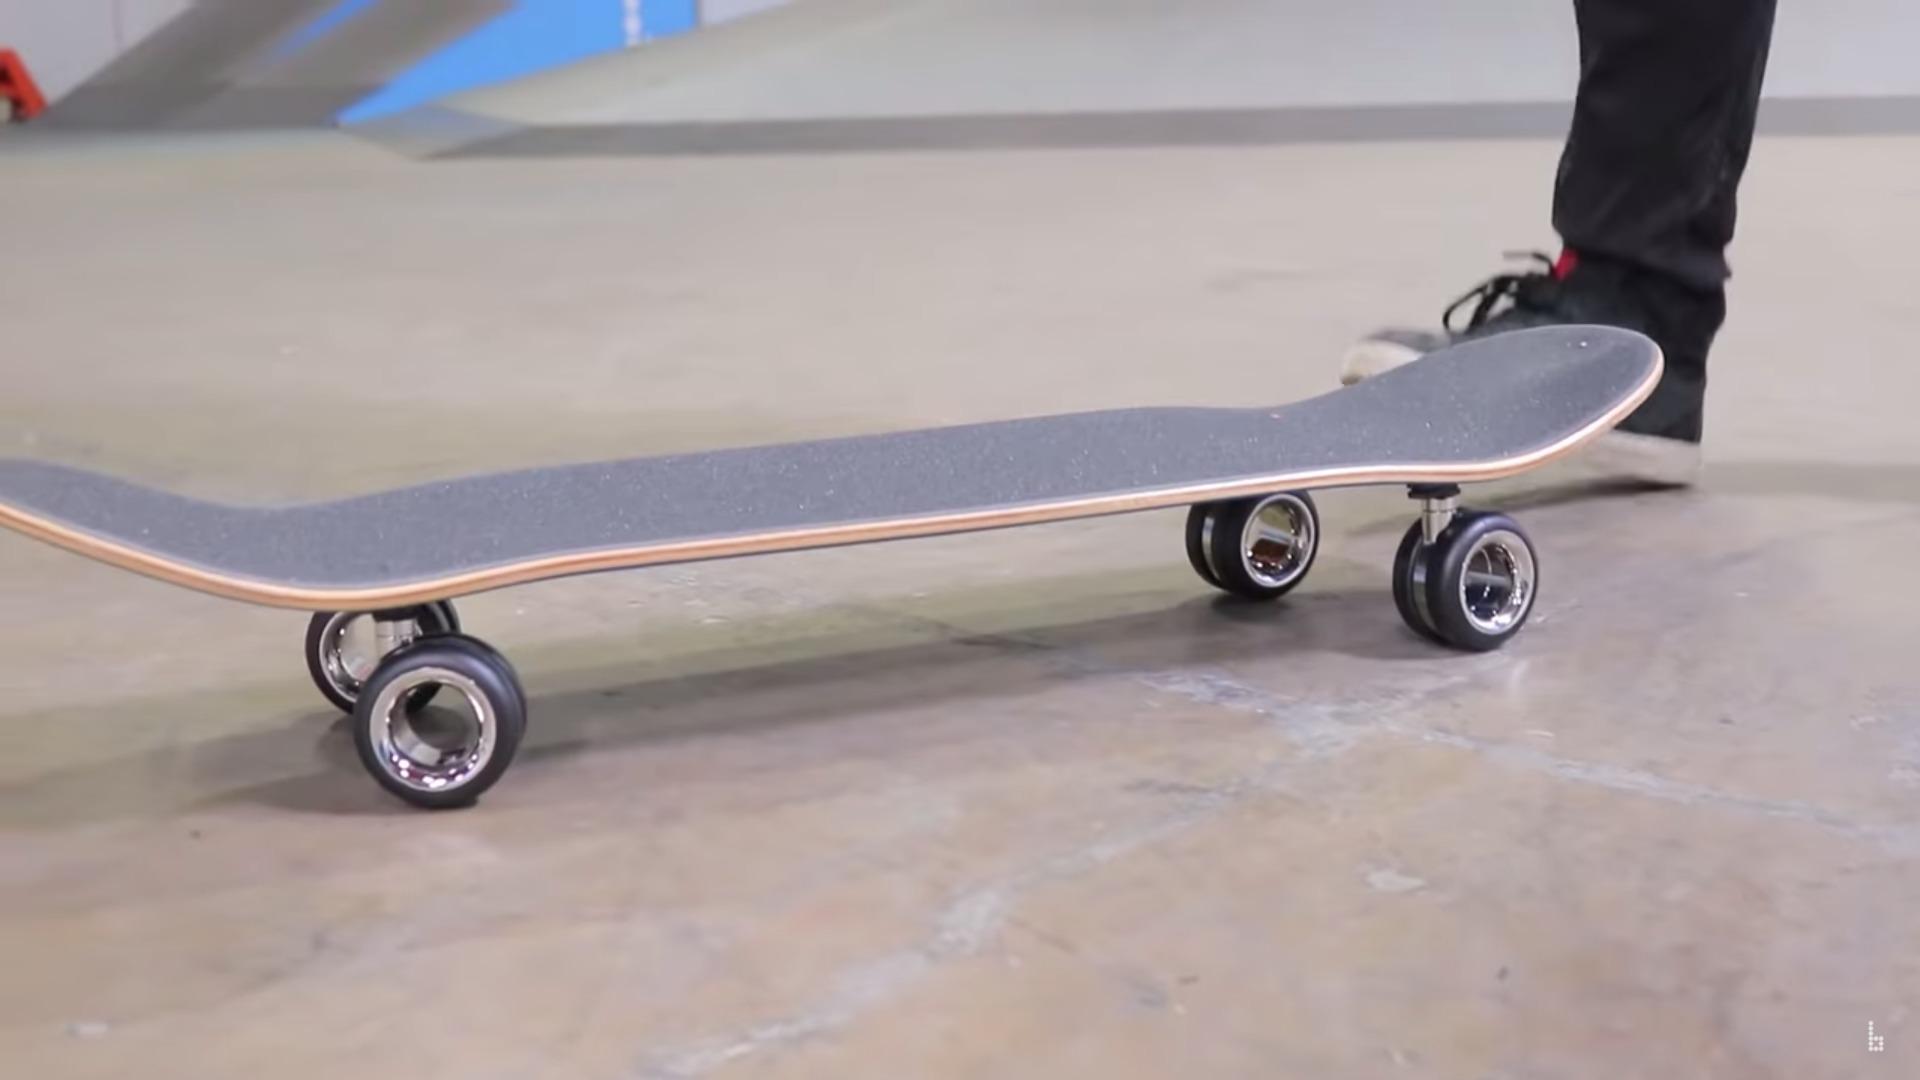 Apple llantas patineta